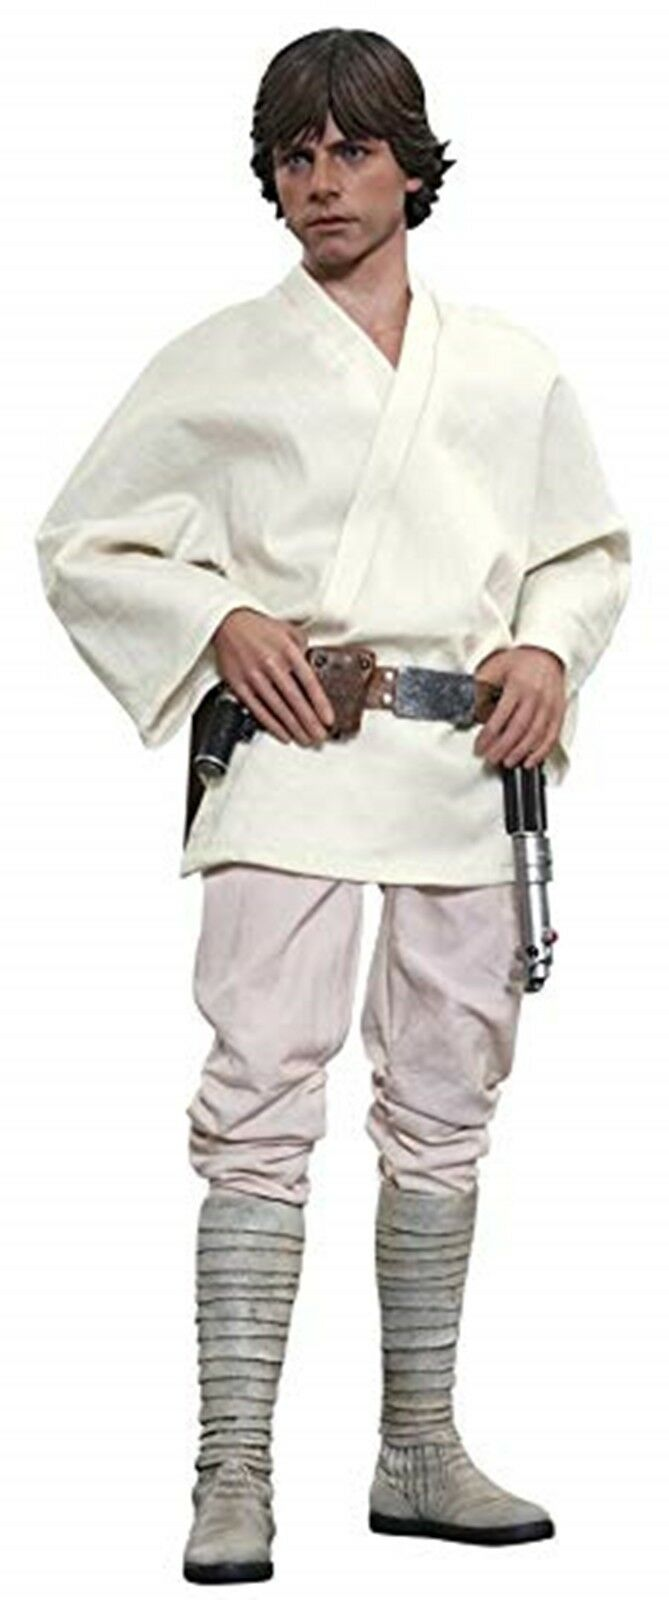 Movie Masterpiece Star Wars Episode 4   New Hope Luke Skywalker 1 6 Hot Toys NEW